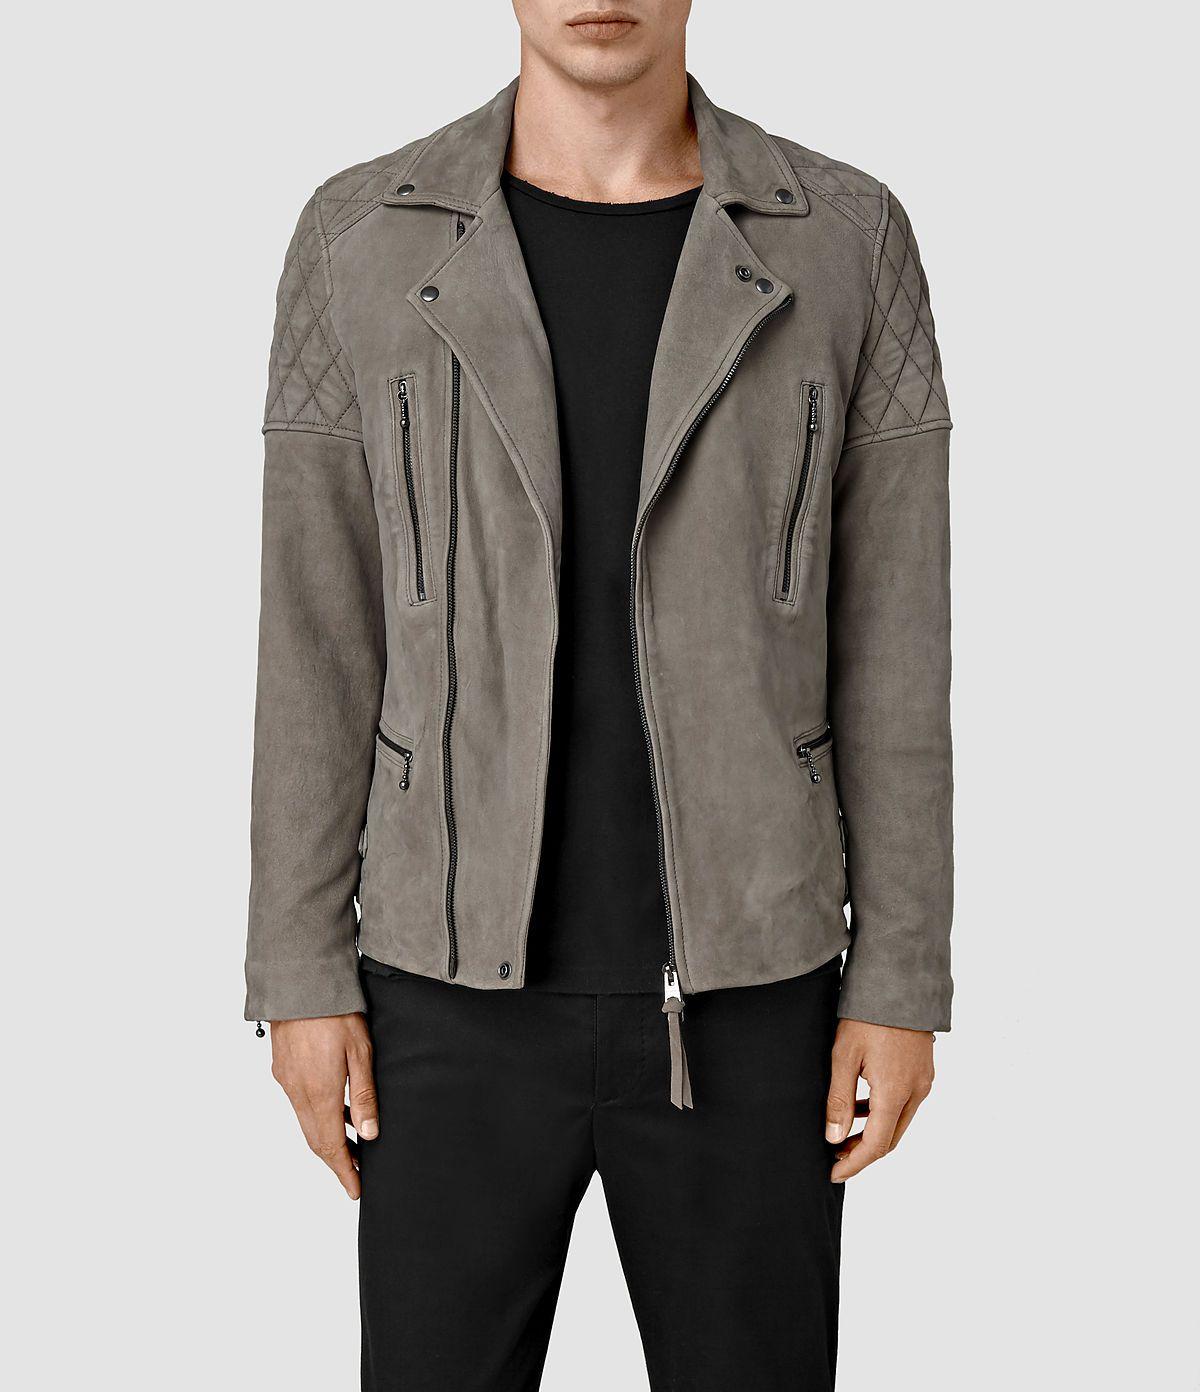 Allsaints New Arrivals Mens Kenji Suede Biker Jacket Leather Jacket Men Best Smart Casual Outfits Suede Biker Jacket [ 1392 x 1200 Pixel ]